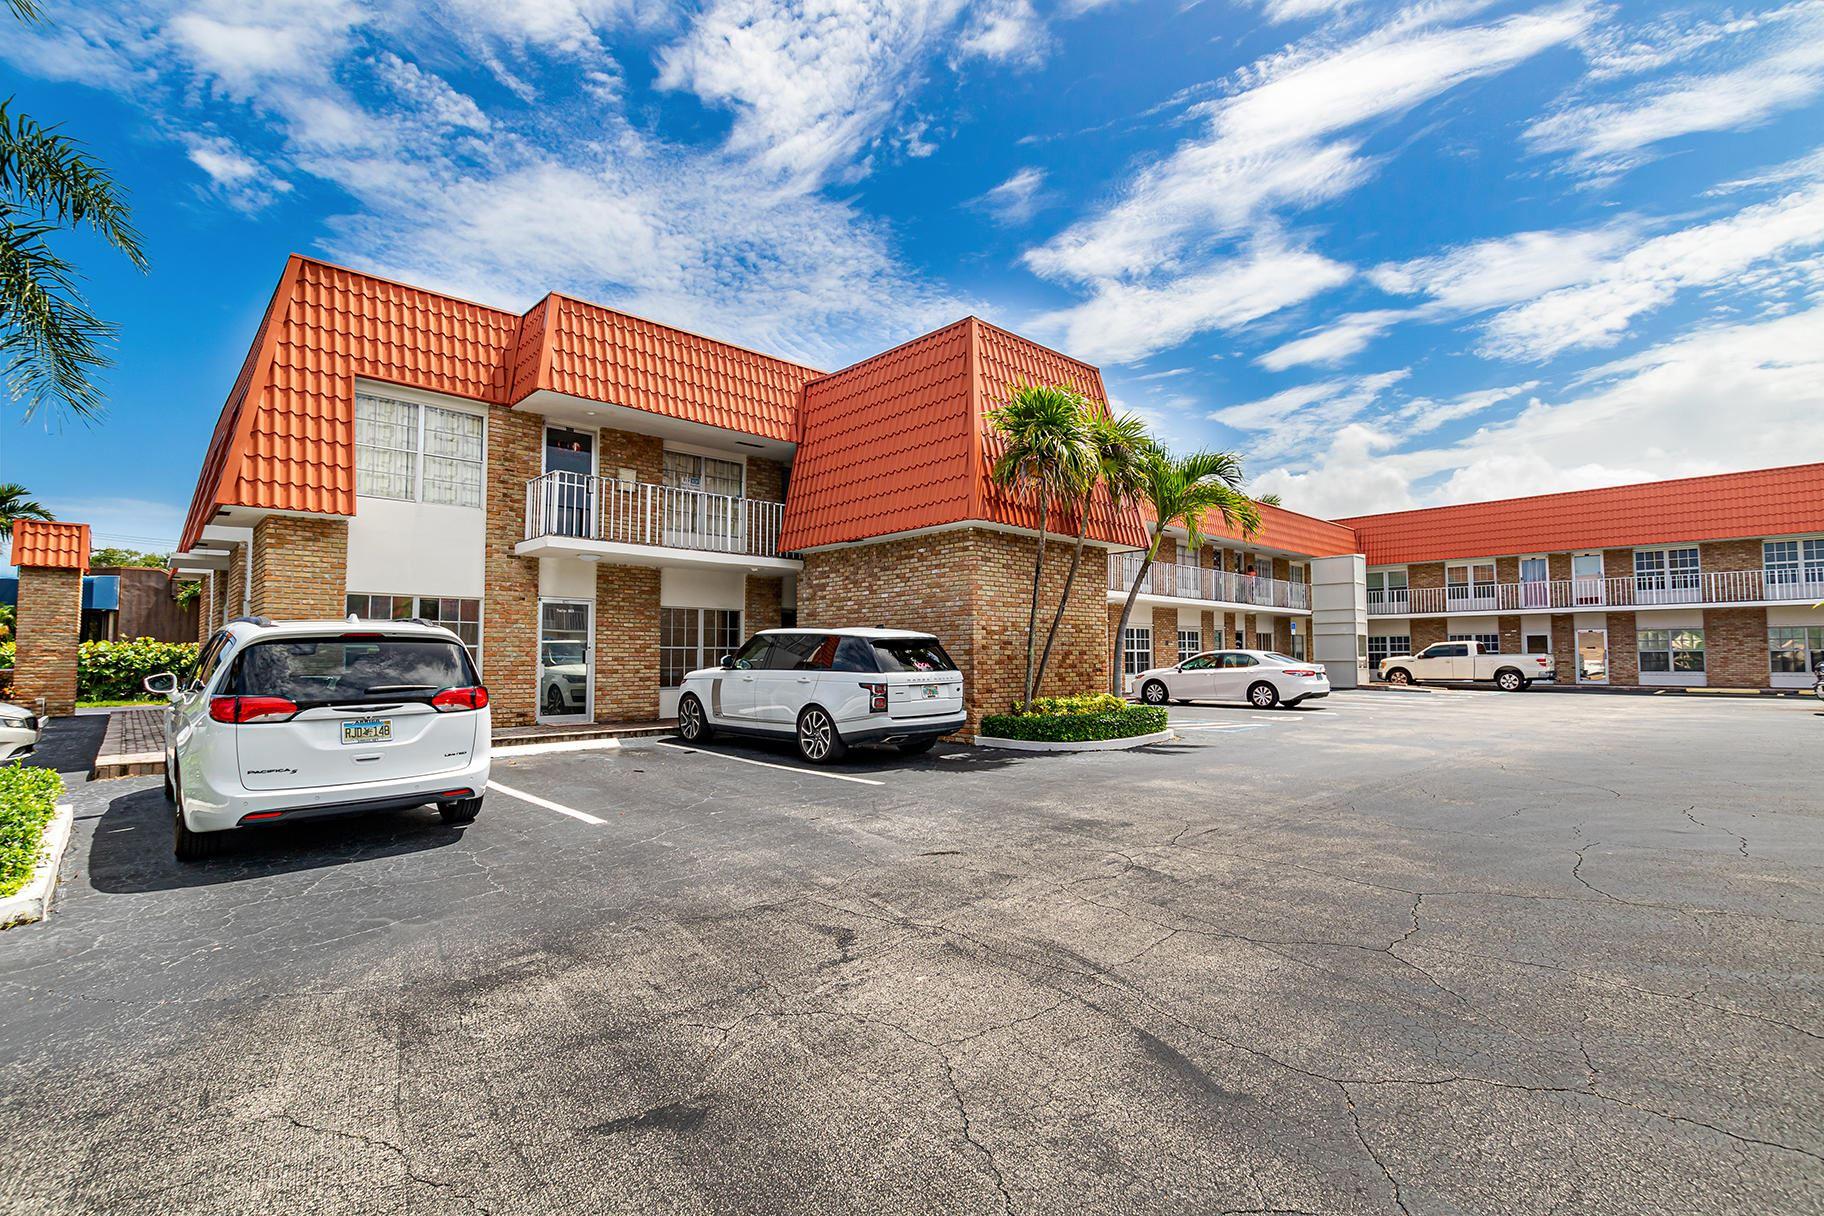 Photo of 721 Us Highway 1 #207-208, North Palm Beach, FL 33408 (MLS # RX-10642439)